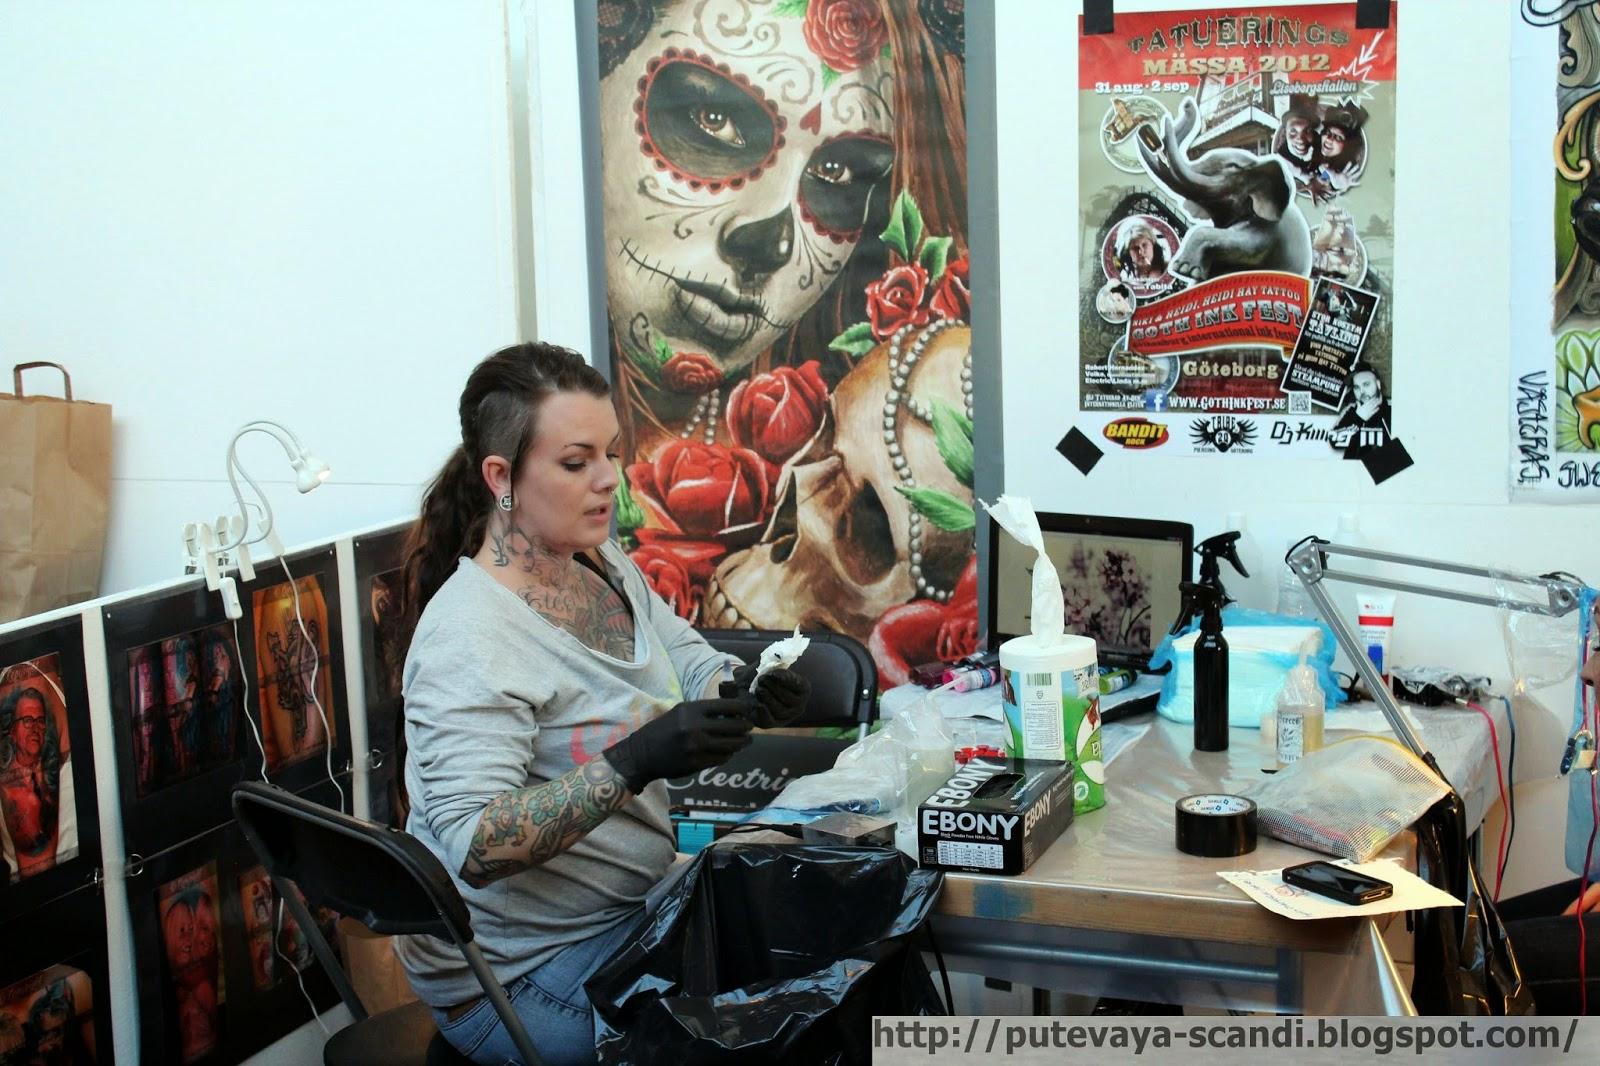 татуировки на тему музыки - Музыка Каталог эскизов тату uCoz